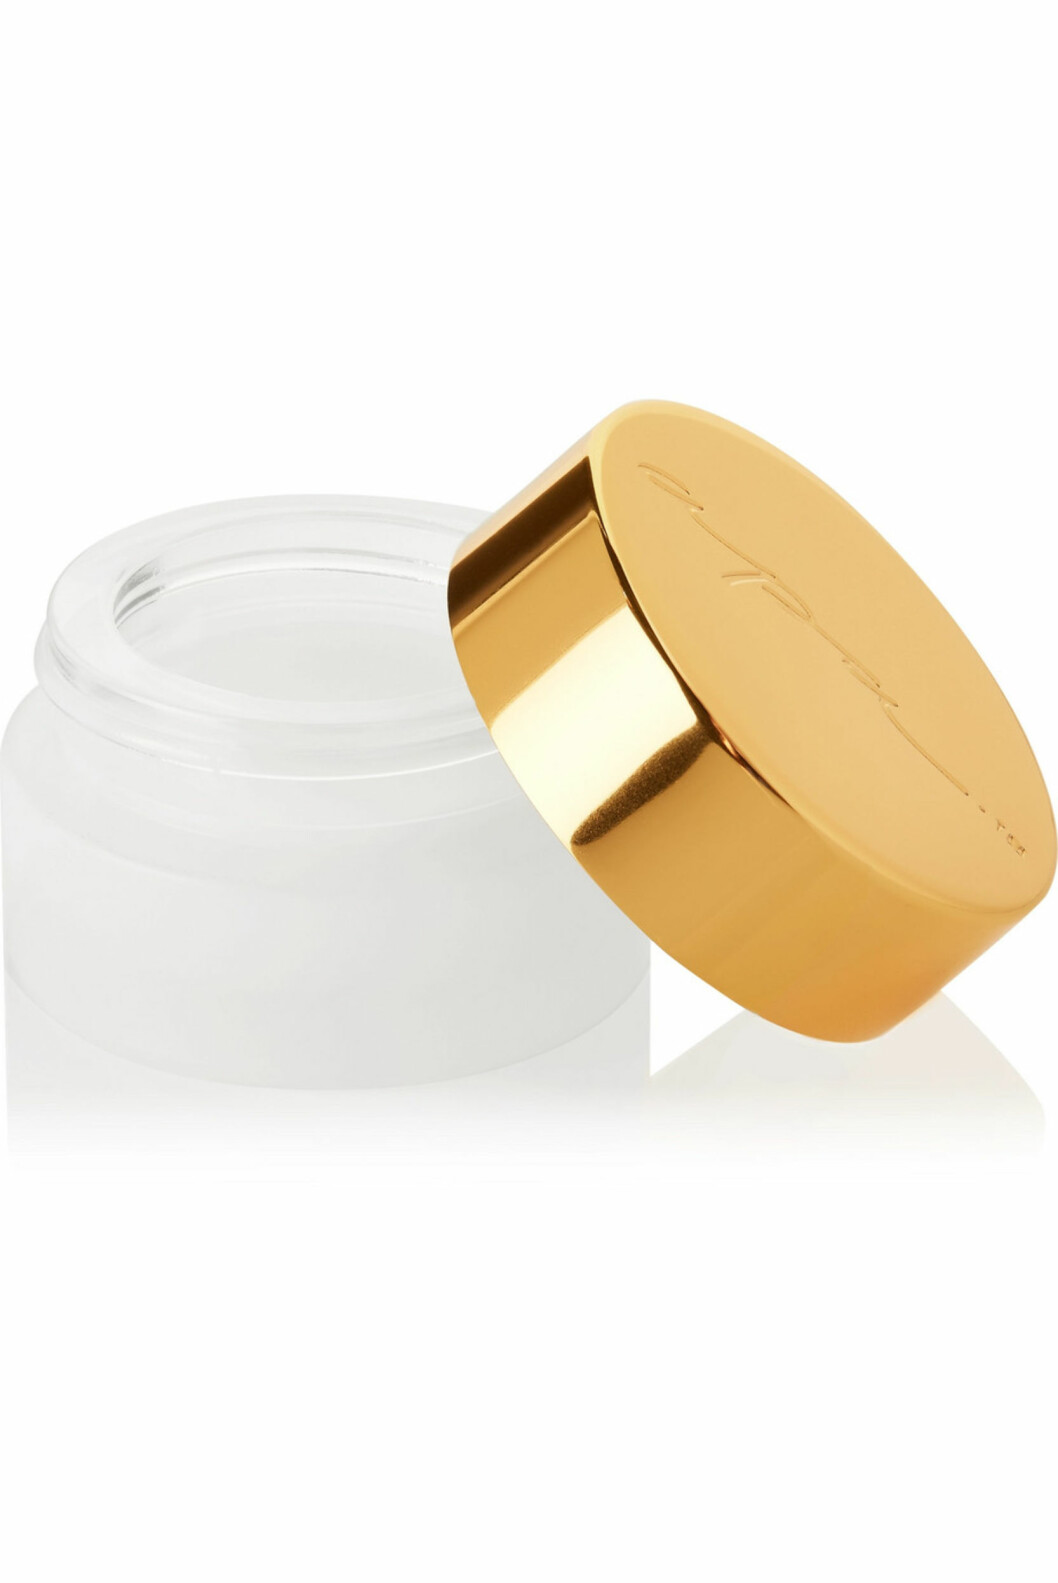 <strong>Leppebalm fra Apa Beauty |344,-| https:</strong>//www.net-a-porter.com/no/en/product/1091770/apa_beauty/lush-lip-balm